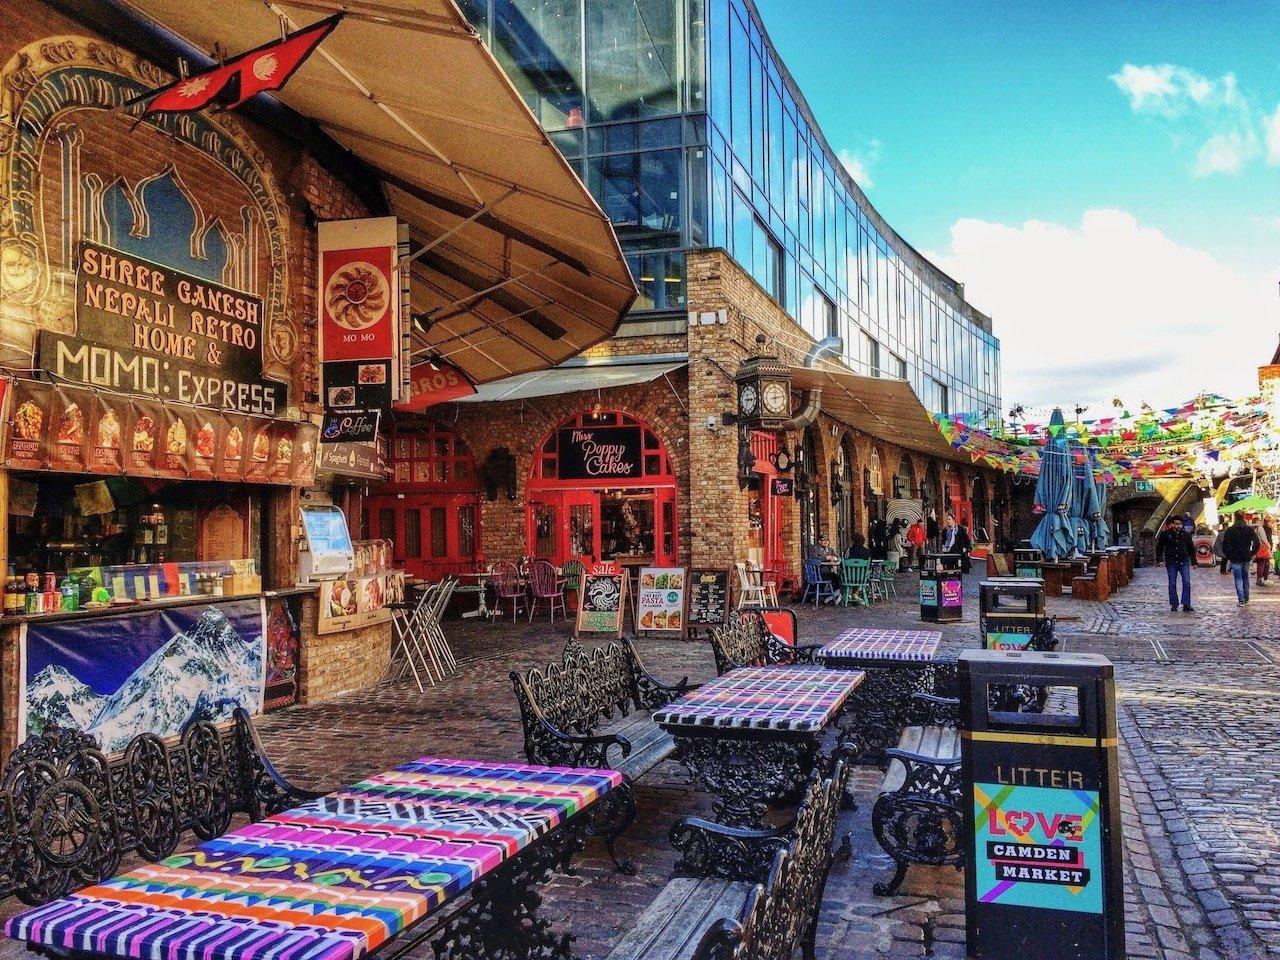 Camden Market in North London